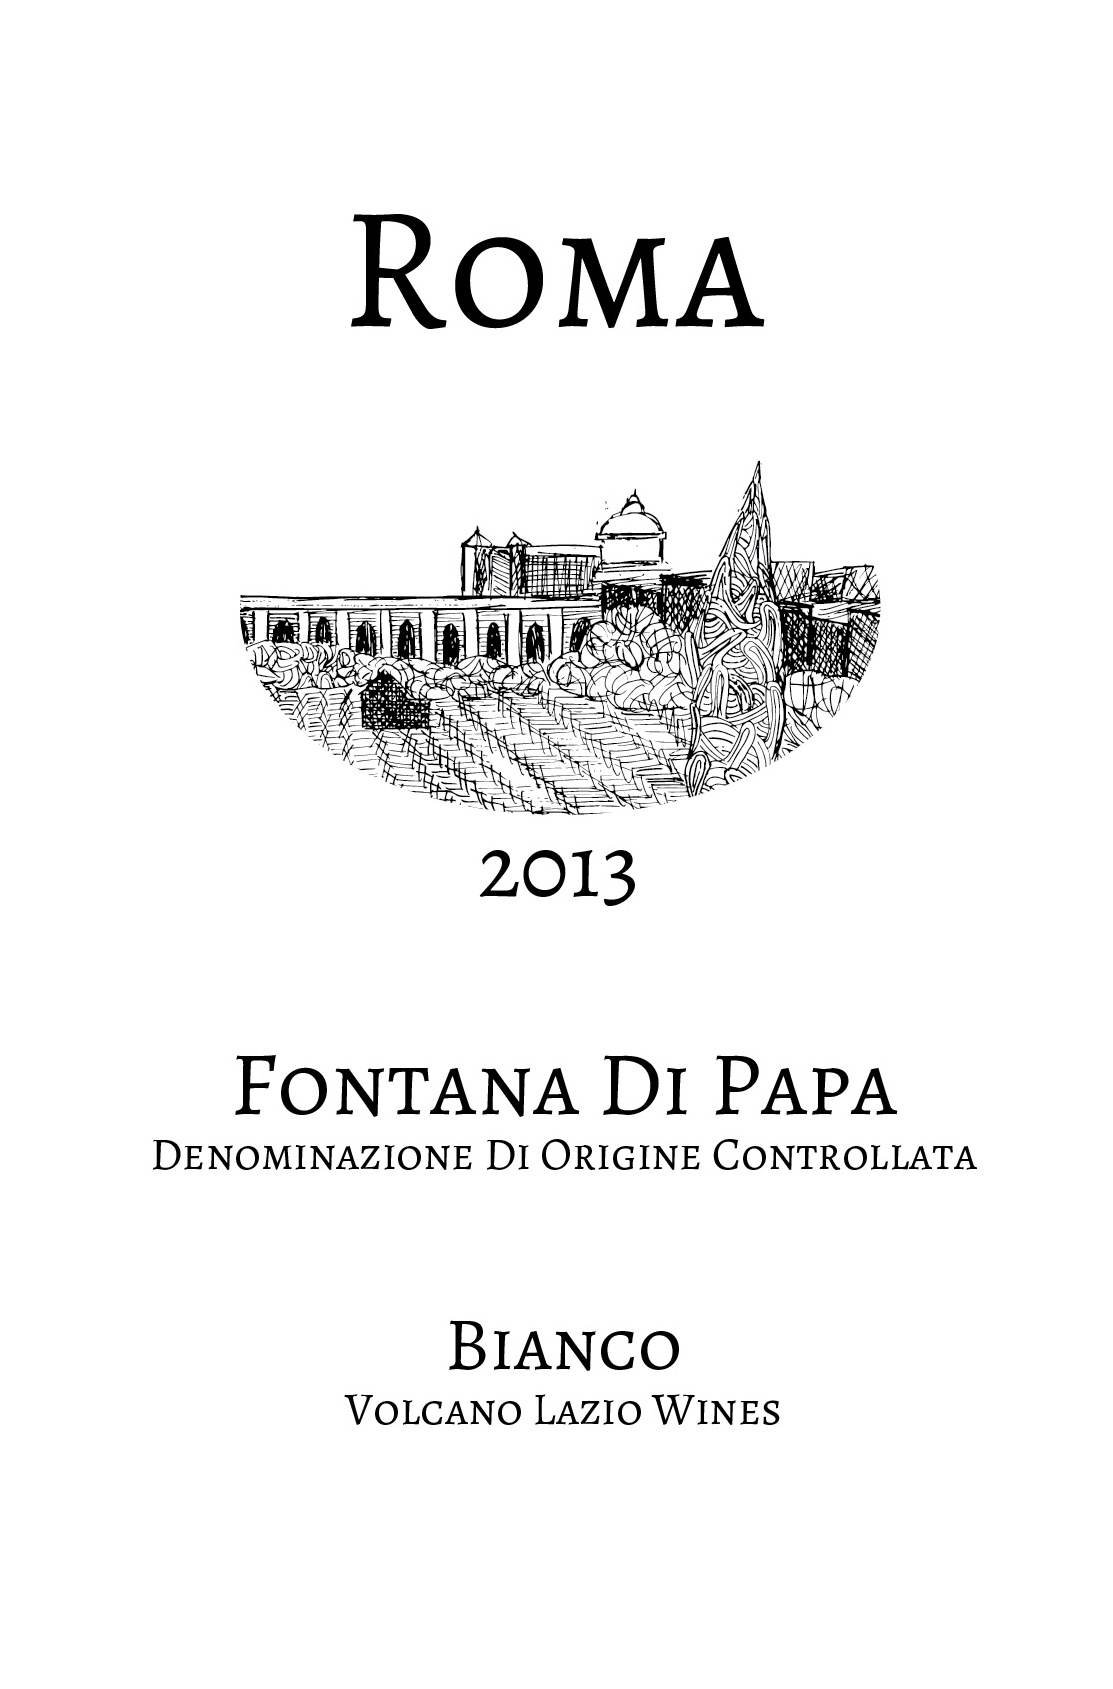 wine labels_Roma 2 .jpg